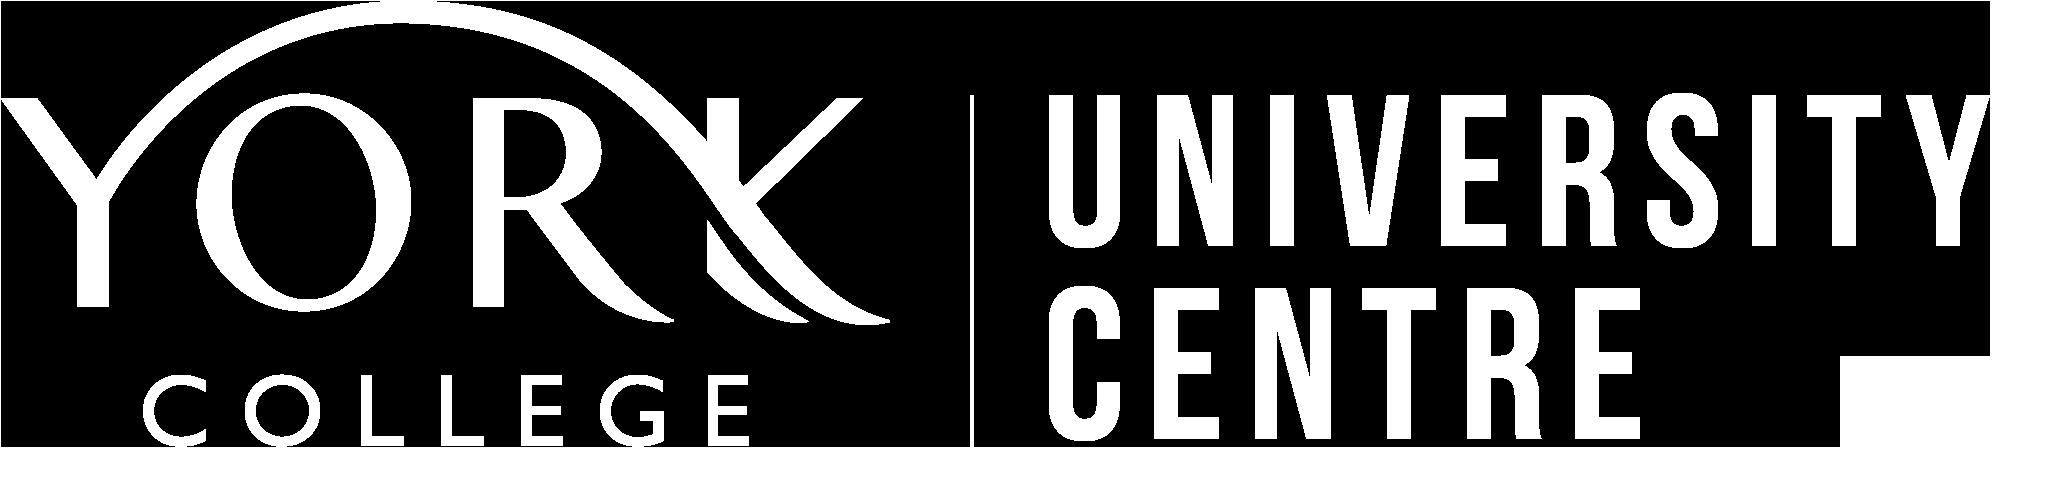 York College University Centre Logo White